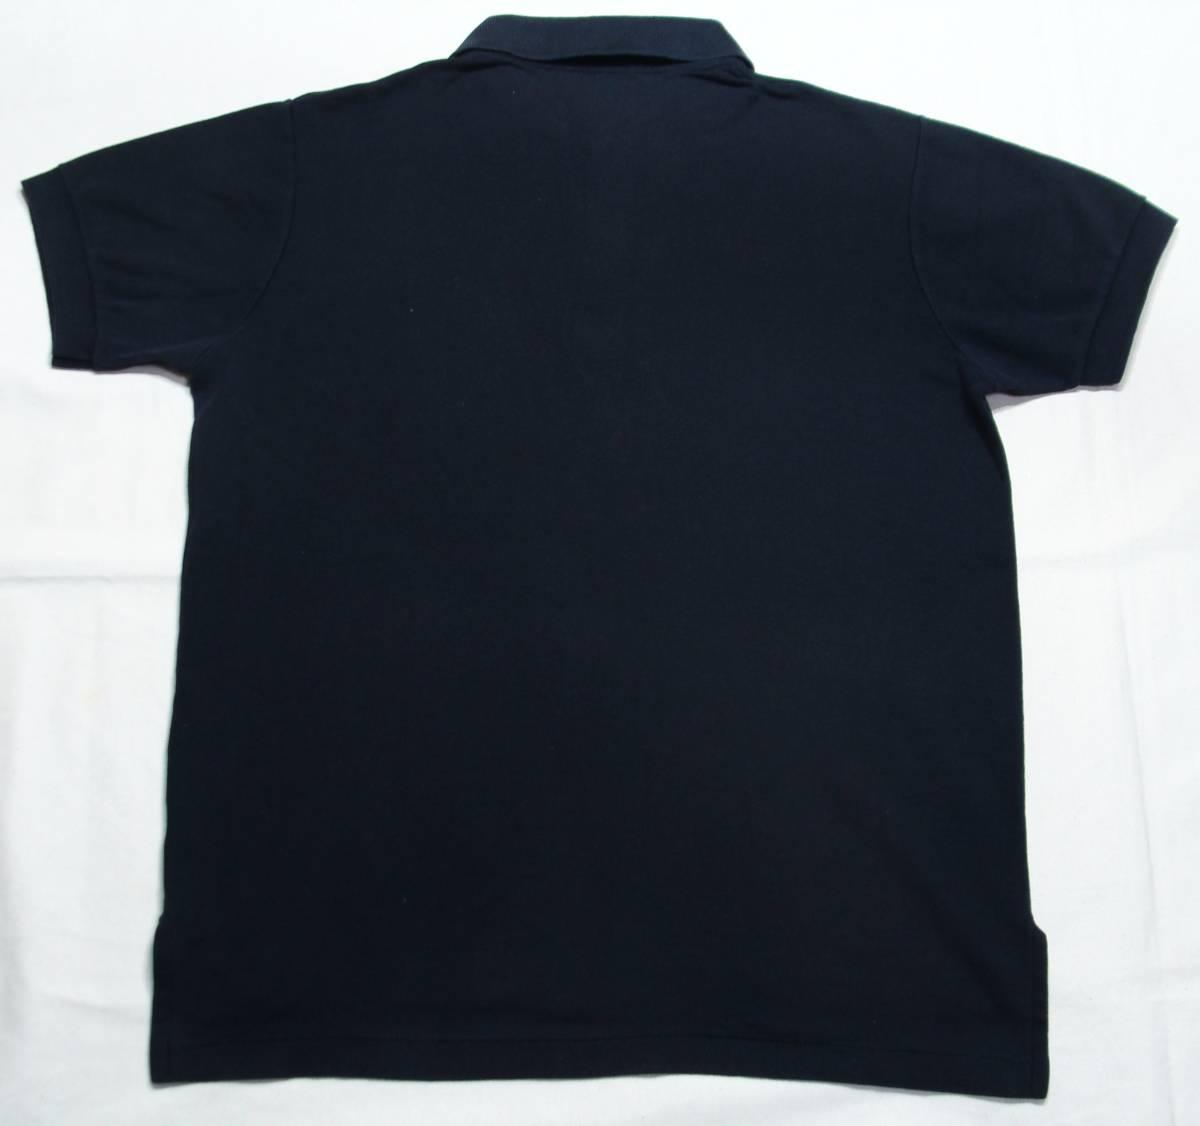 USA製 BROOKS BROTHERS ブルックスブラザーズ ゴールデンフリース 半袖 ポロシャツ サイズL 黒 ブラック 国内正規品_画像6